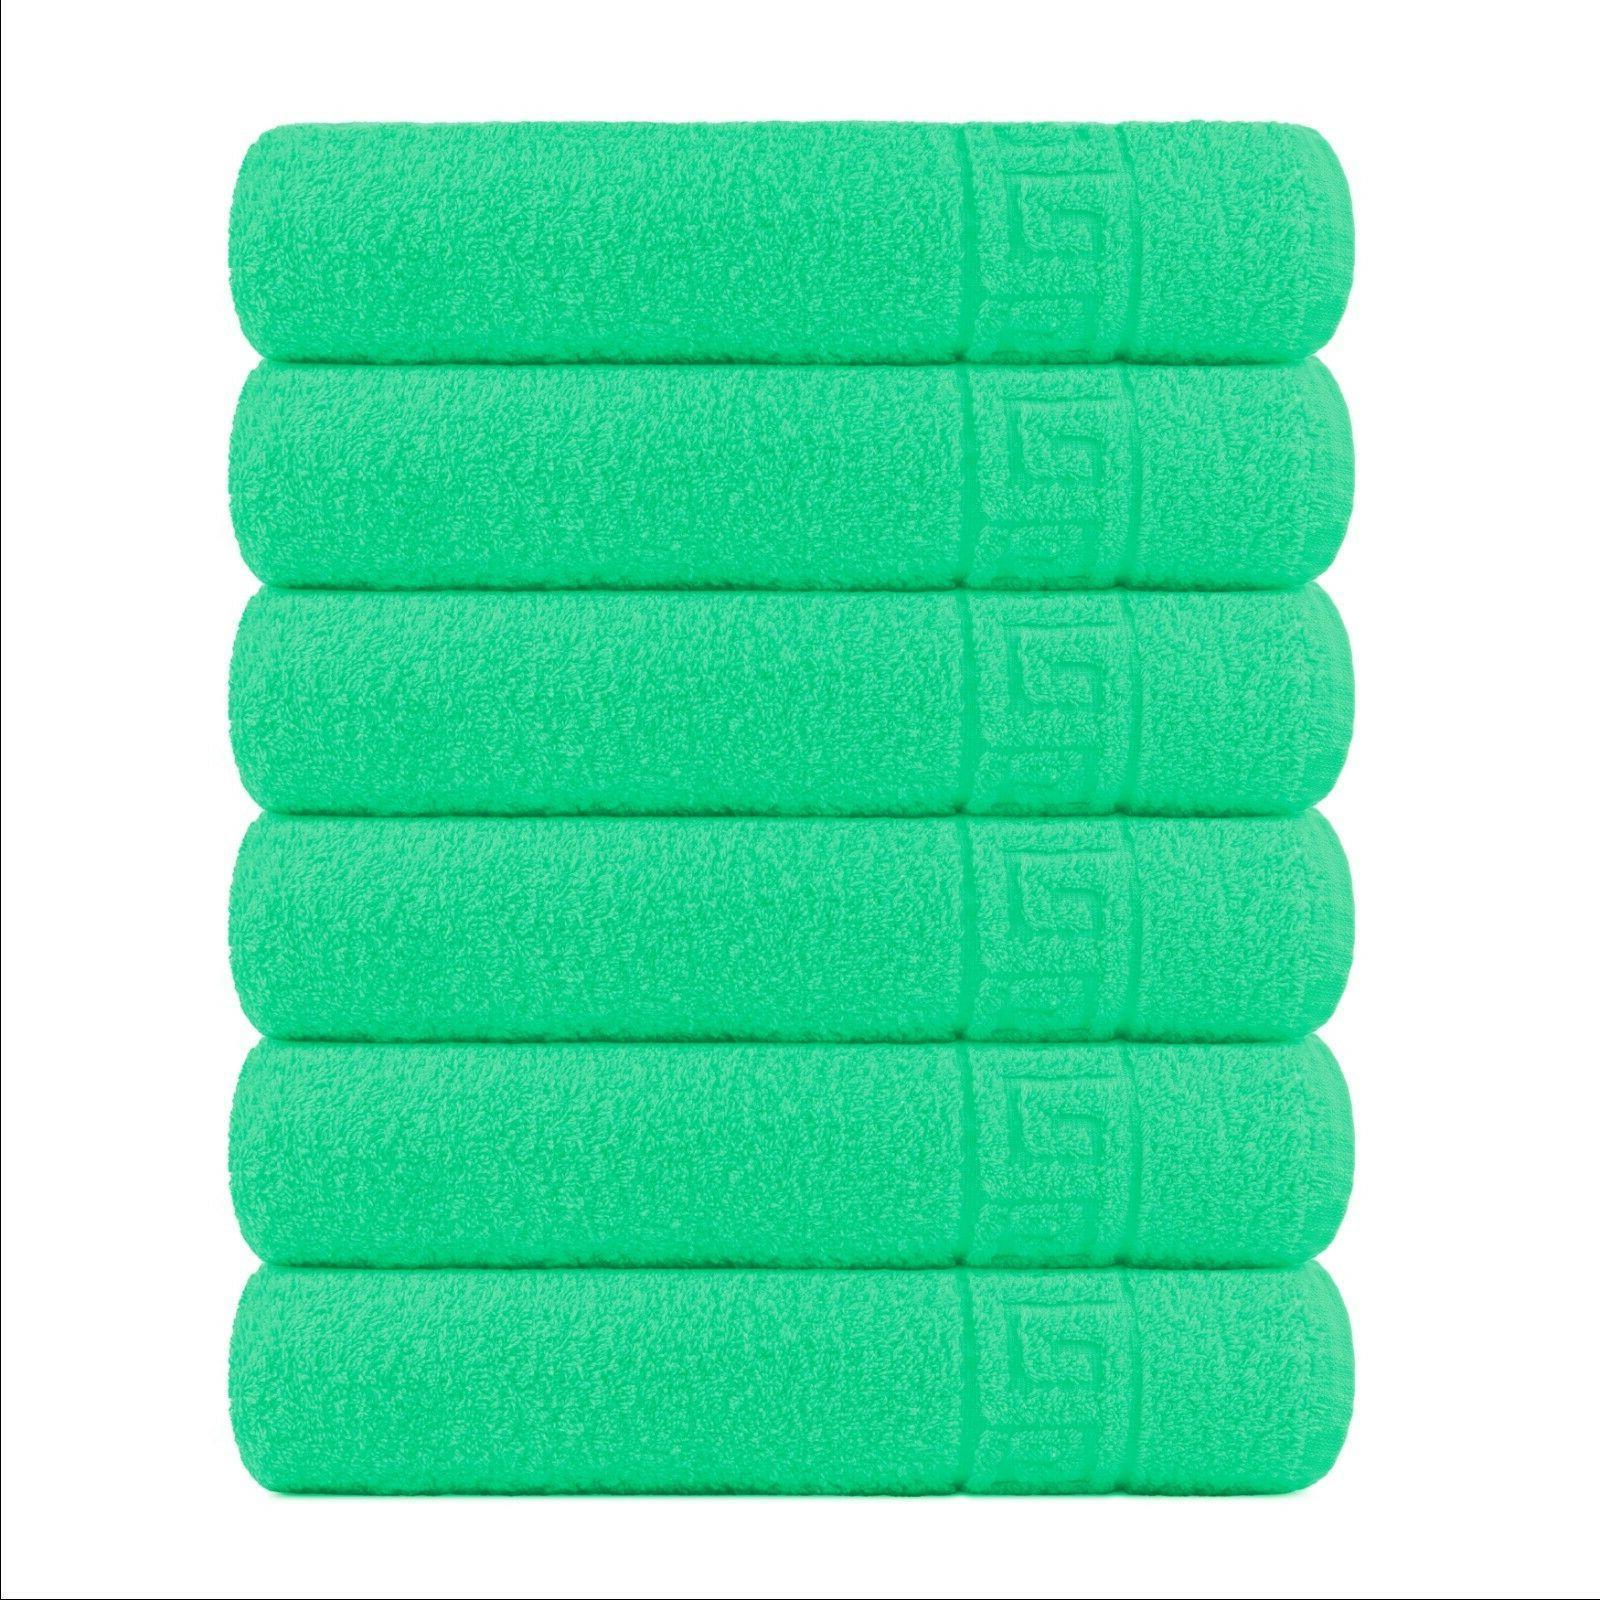 6 Pieces 6 pcc for Bathroom - cotton - Luxury